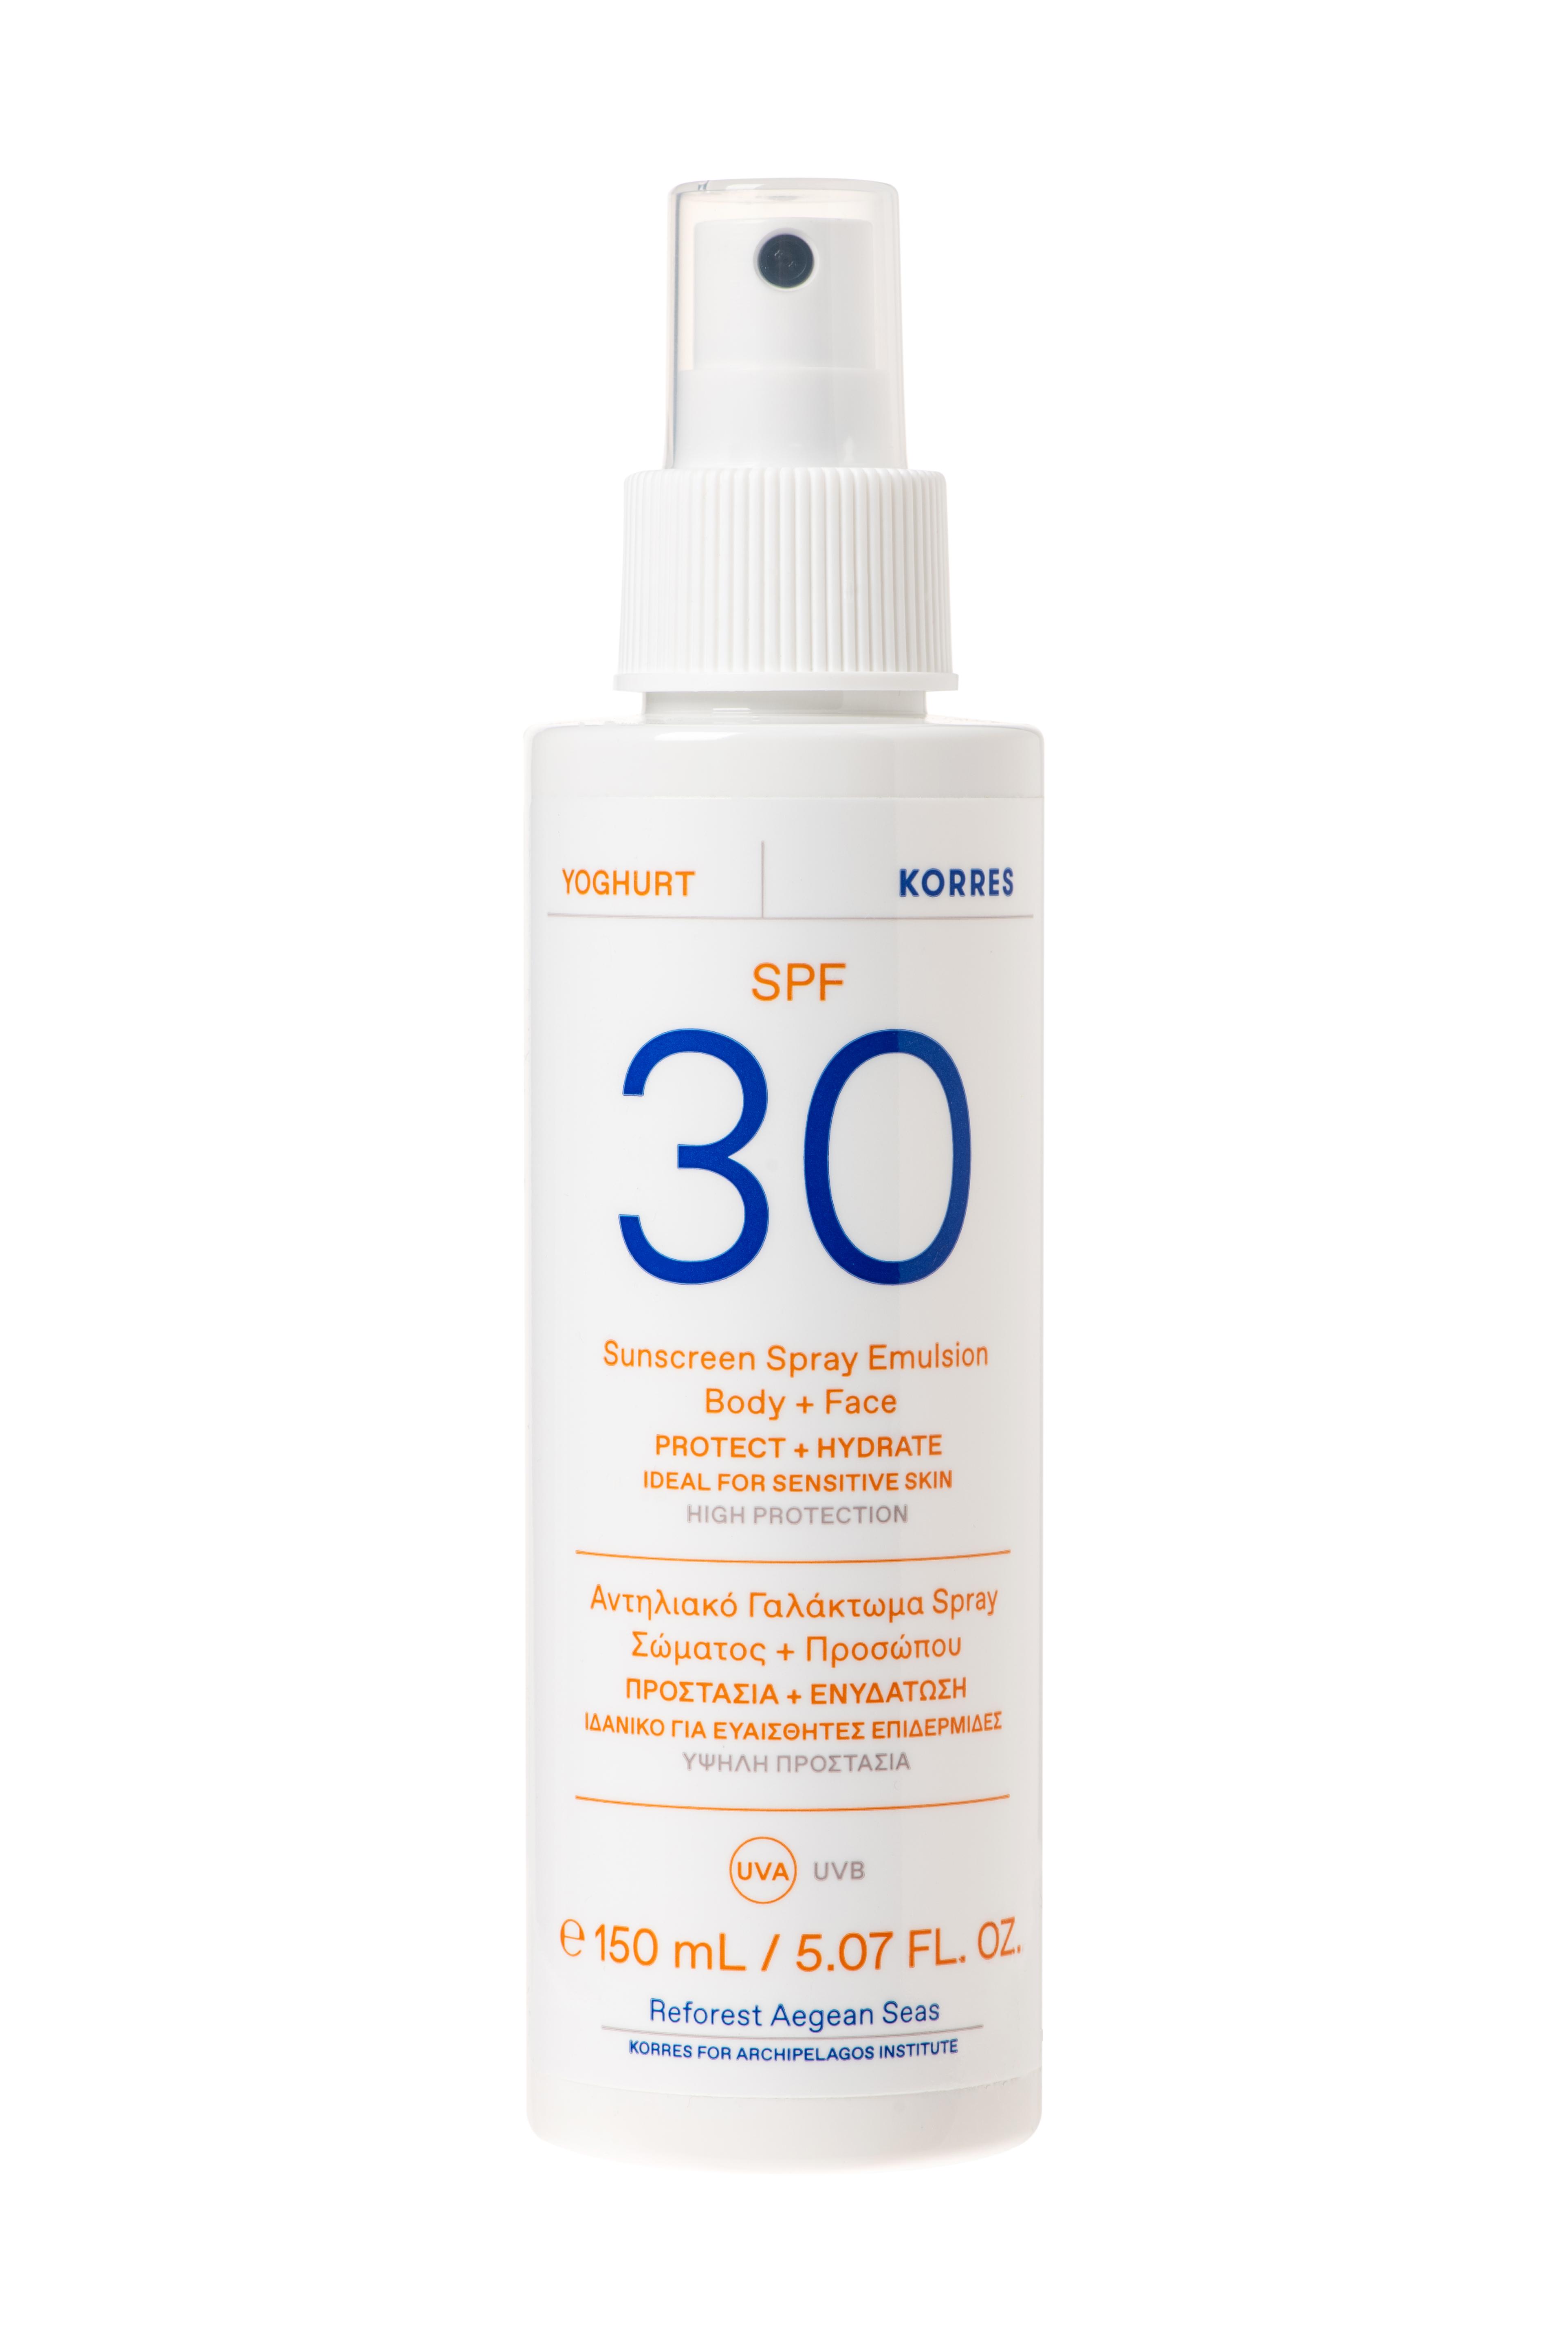 KORRES Γιαουρτι Αντηλιακο Γαλακτωμα Spray ΣωματοςΠροσωπου SPF30